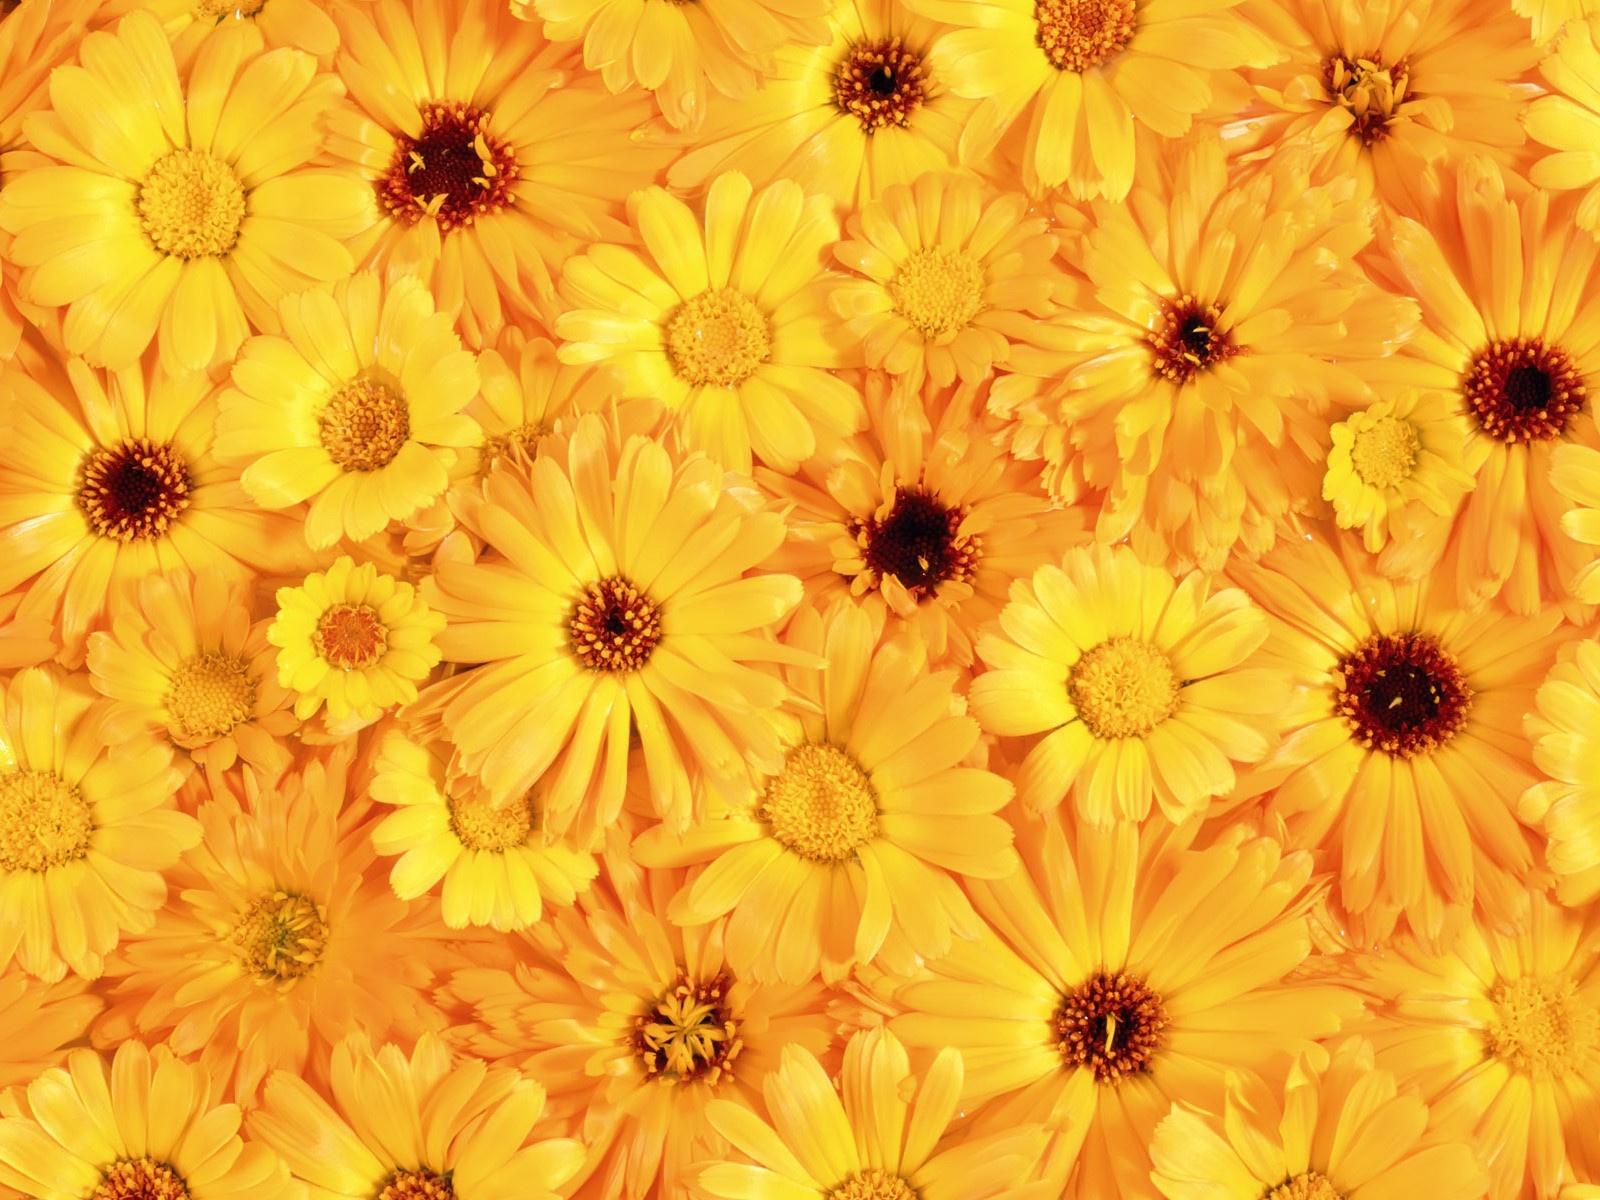 Yellow Flowers Wallpaper 1600x1200 51936